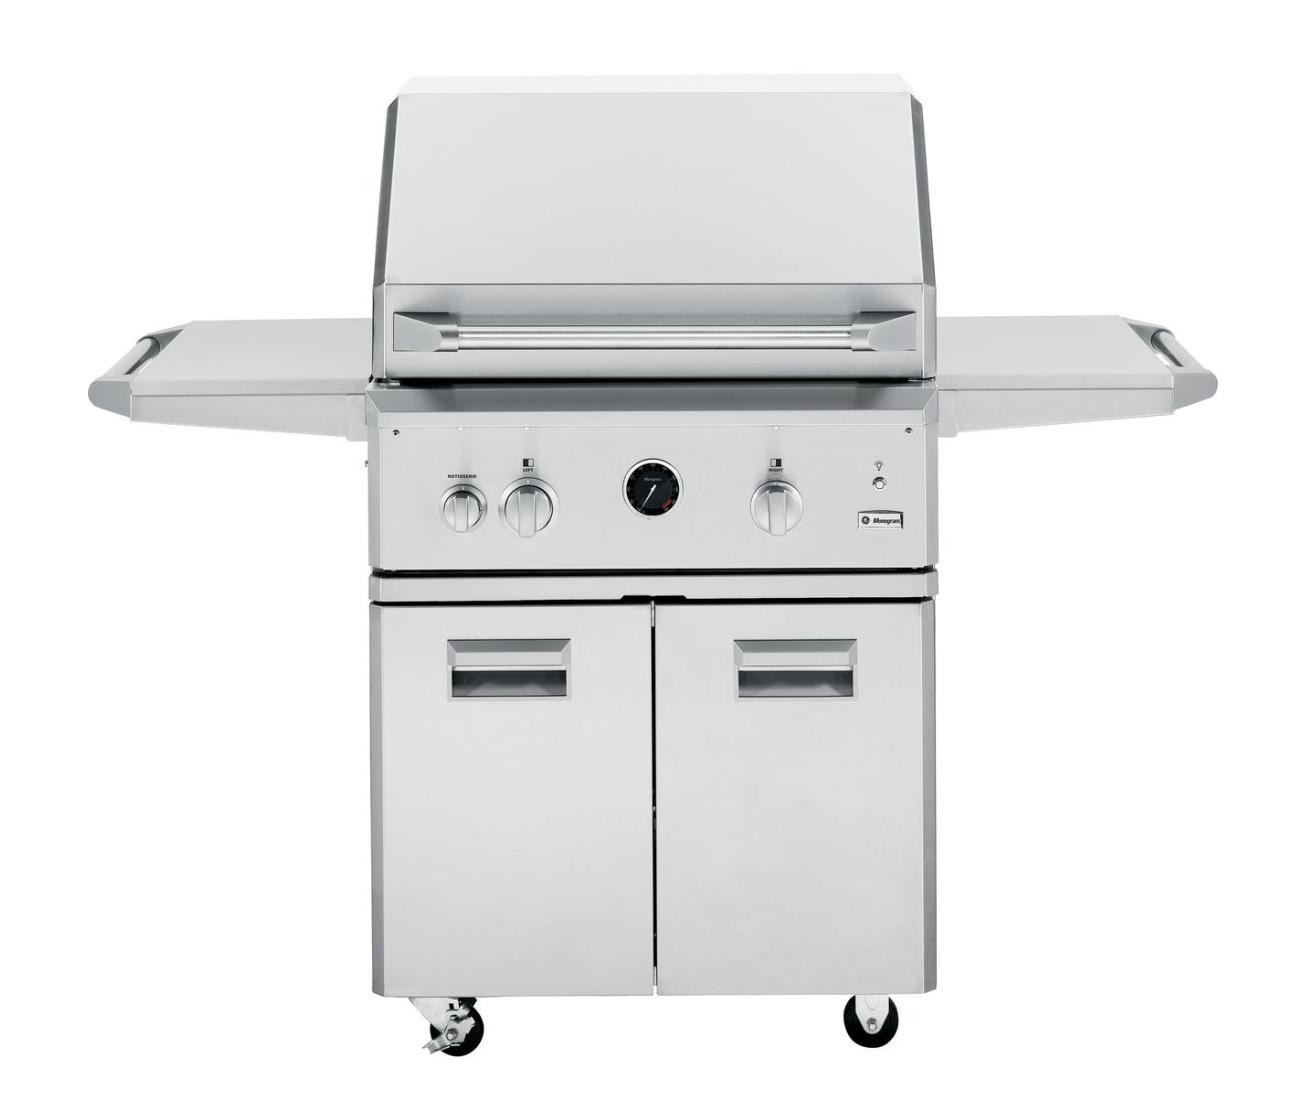 GE Monogram appliances outdoor grill